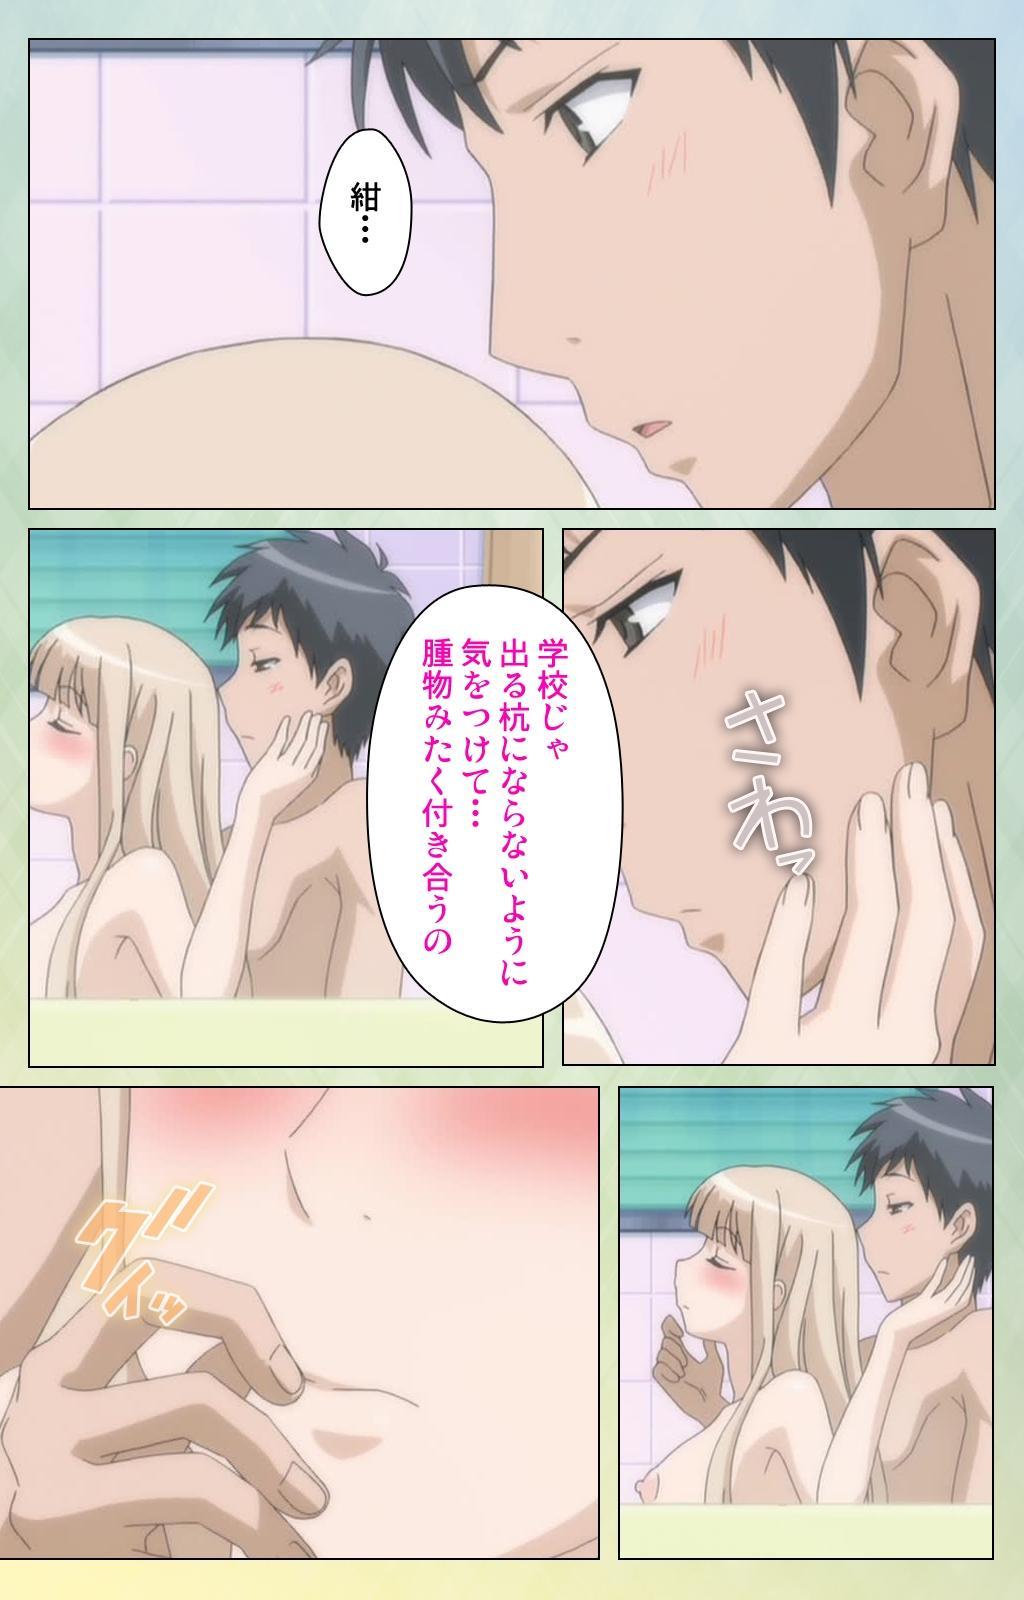 Furueru Kuchibiru fuzzy lips1 Complete Ban 96